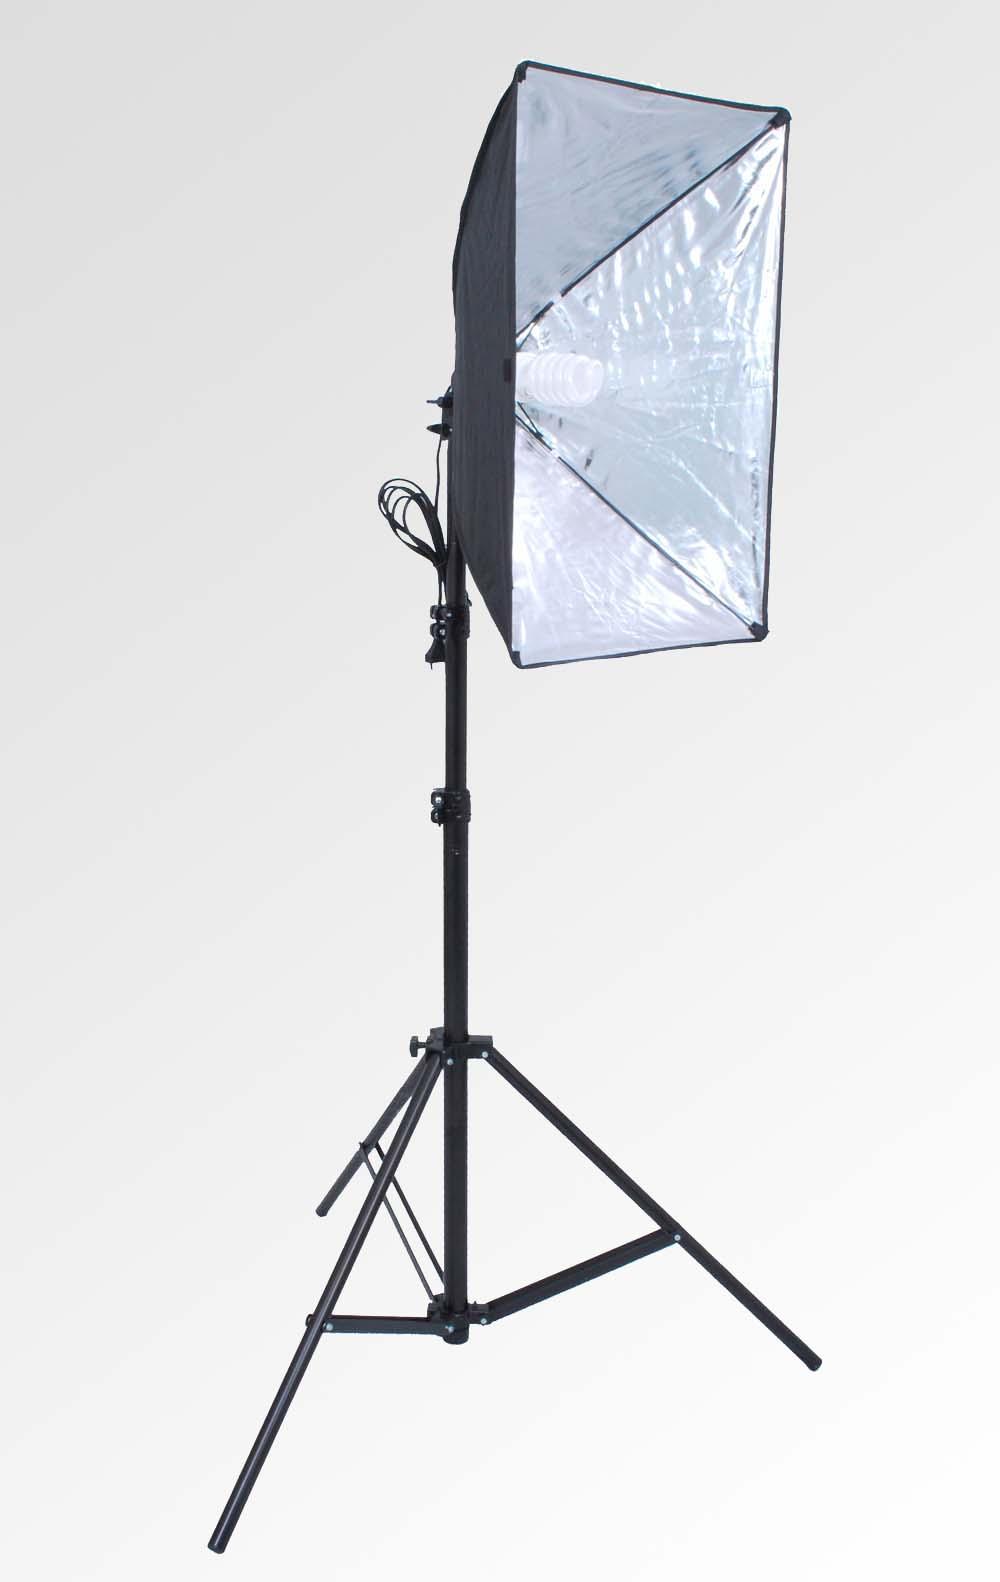 esmart germany foto schnellstart energiesparlampe 50 w 200 w e27 tageslicht kaltwei k. Black Bedroom Furniture Sets. Home Design Ideas